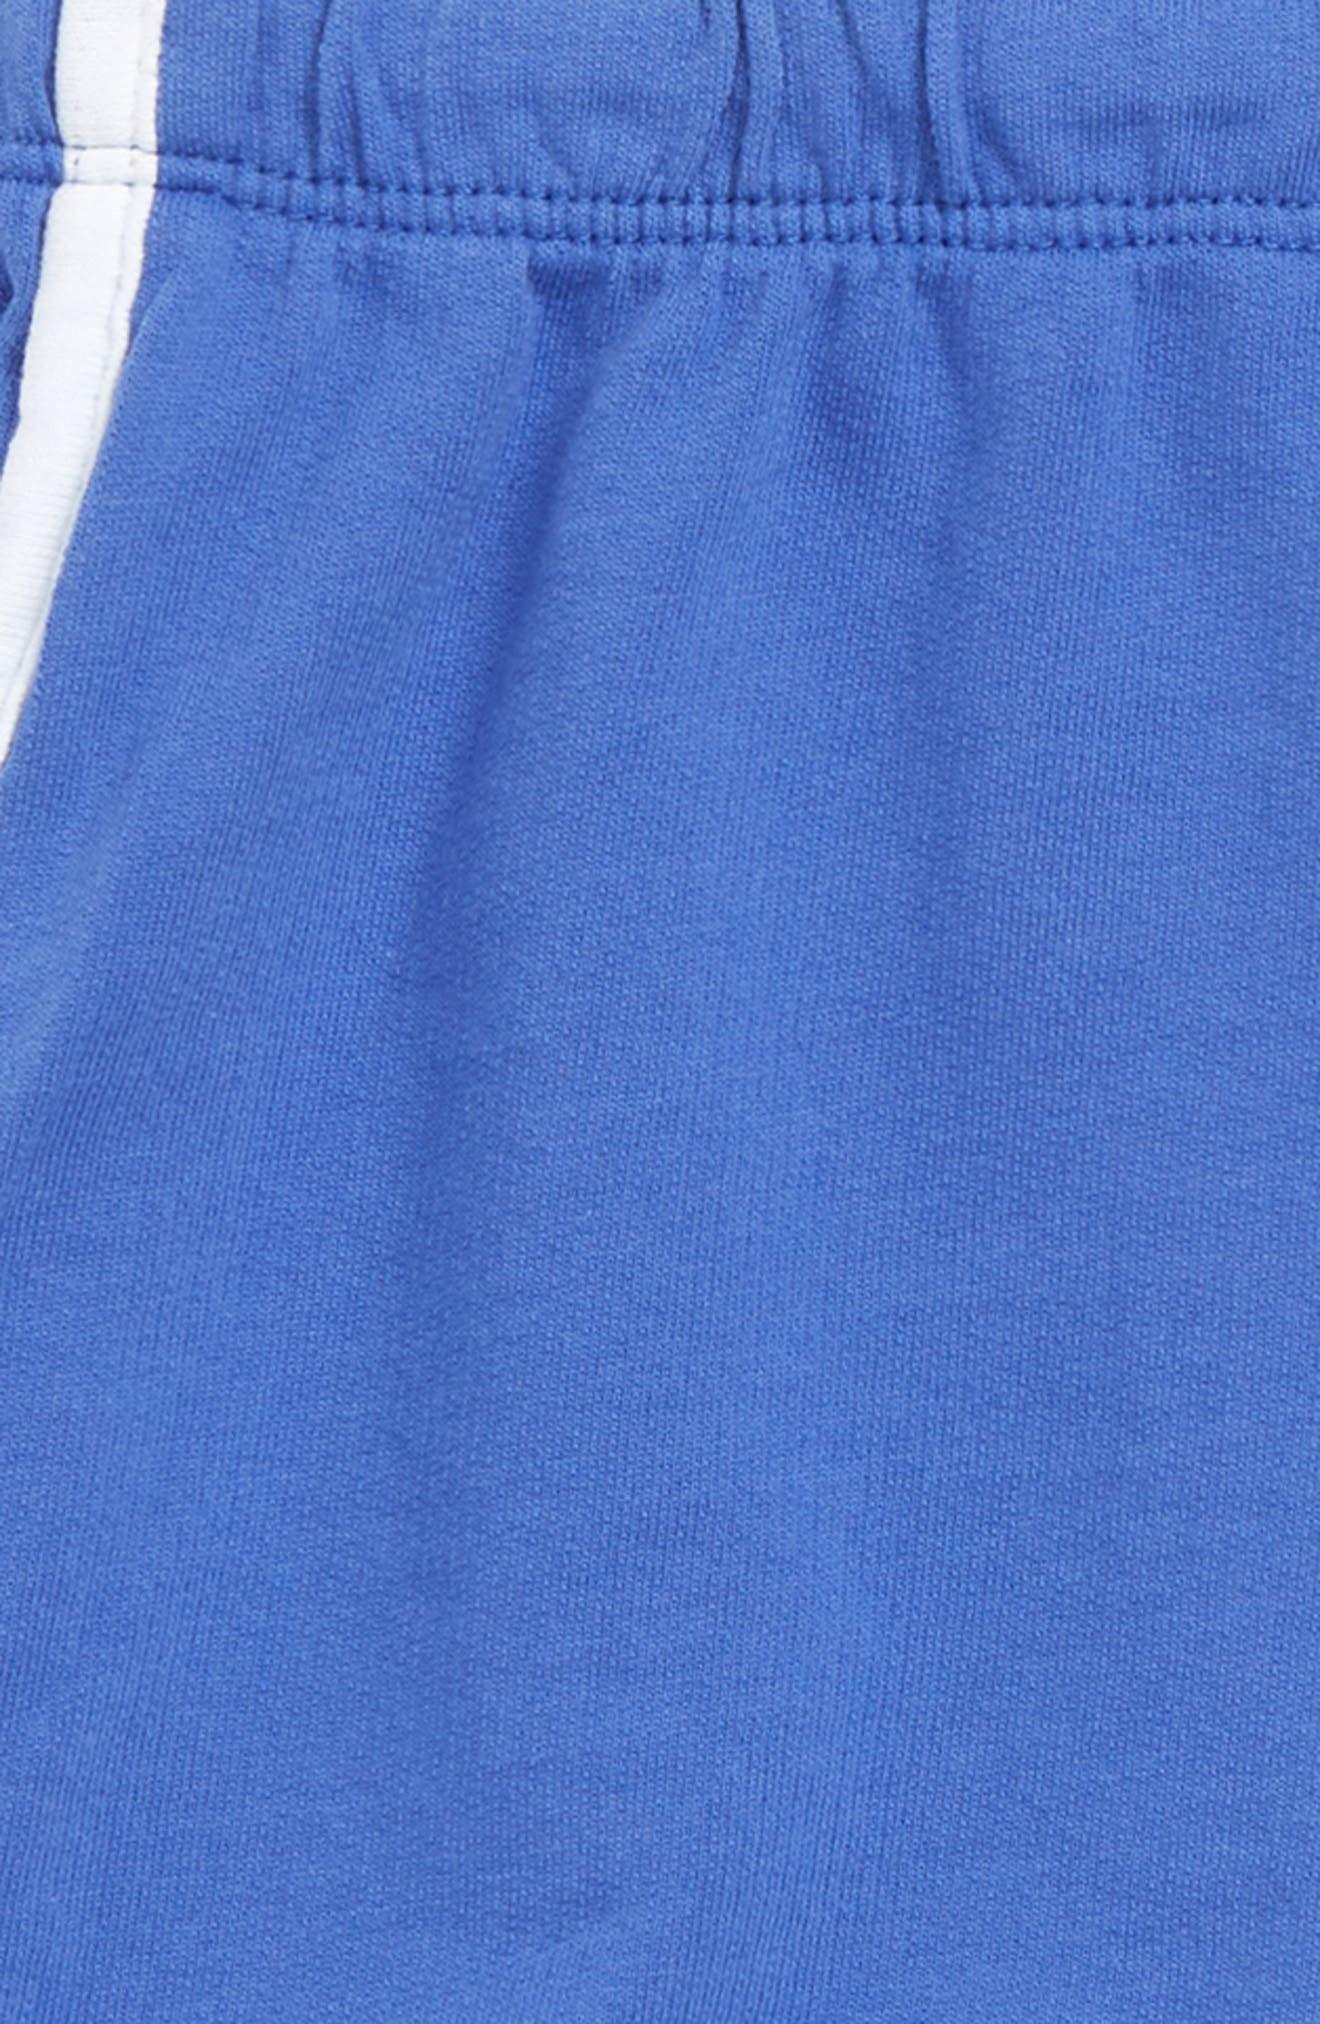 Cotton Dolphin Shorts,                             Alternate thumbnail 10, color,